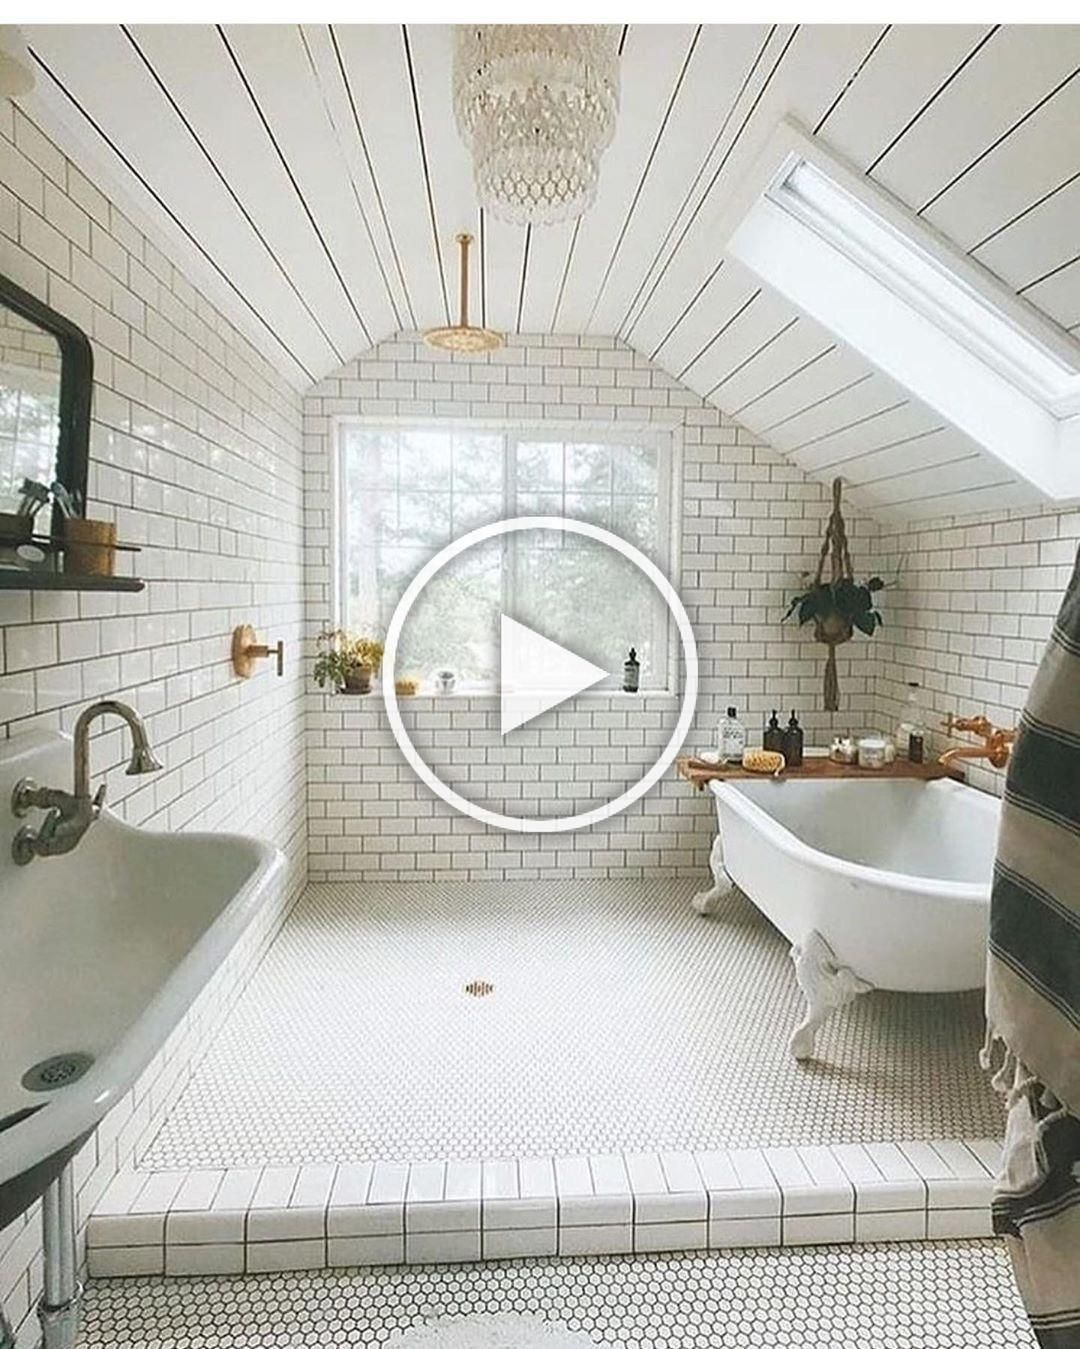 50 Attic Bathrooms To Inspire Your Next Renovation Attic Bathroom Plumbing Attic Bathroom Sloped Ceiling Attic Bat In 2020 Bathroom Cost Attic Shower Bathroom Plumbing